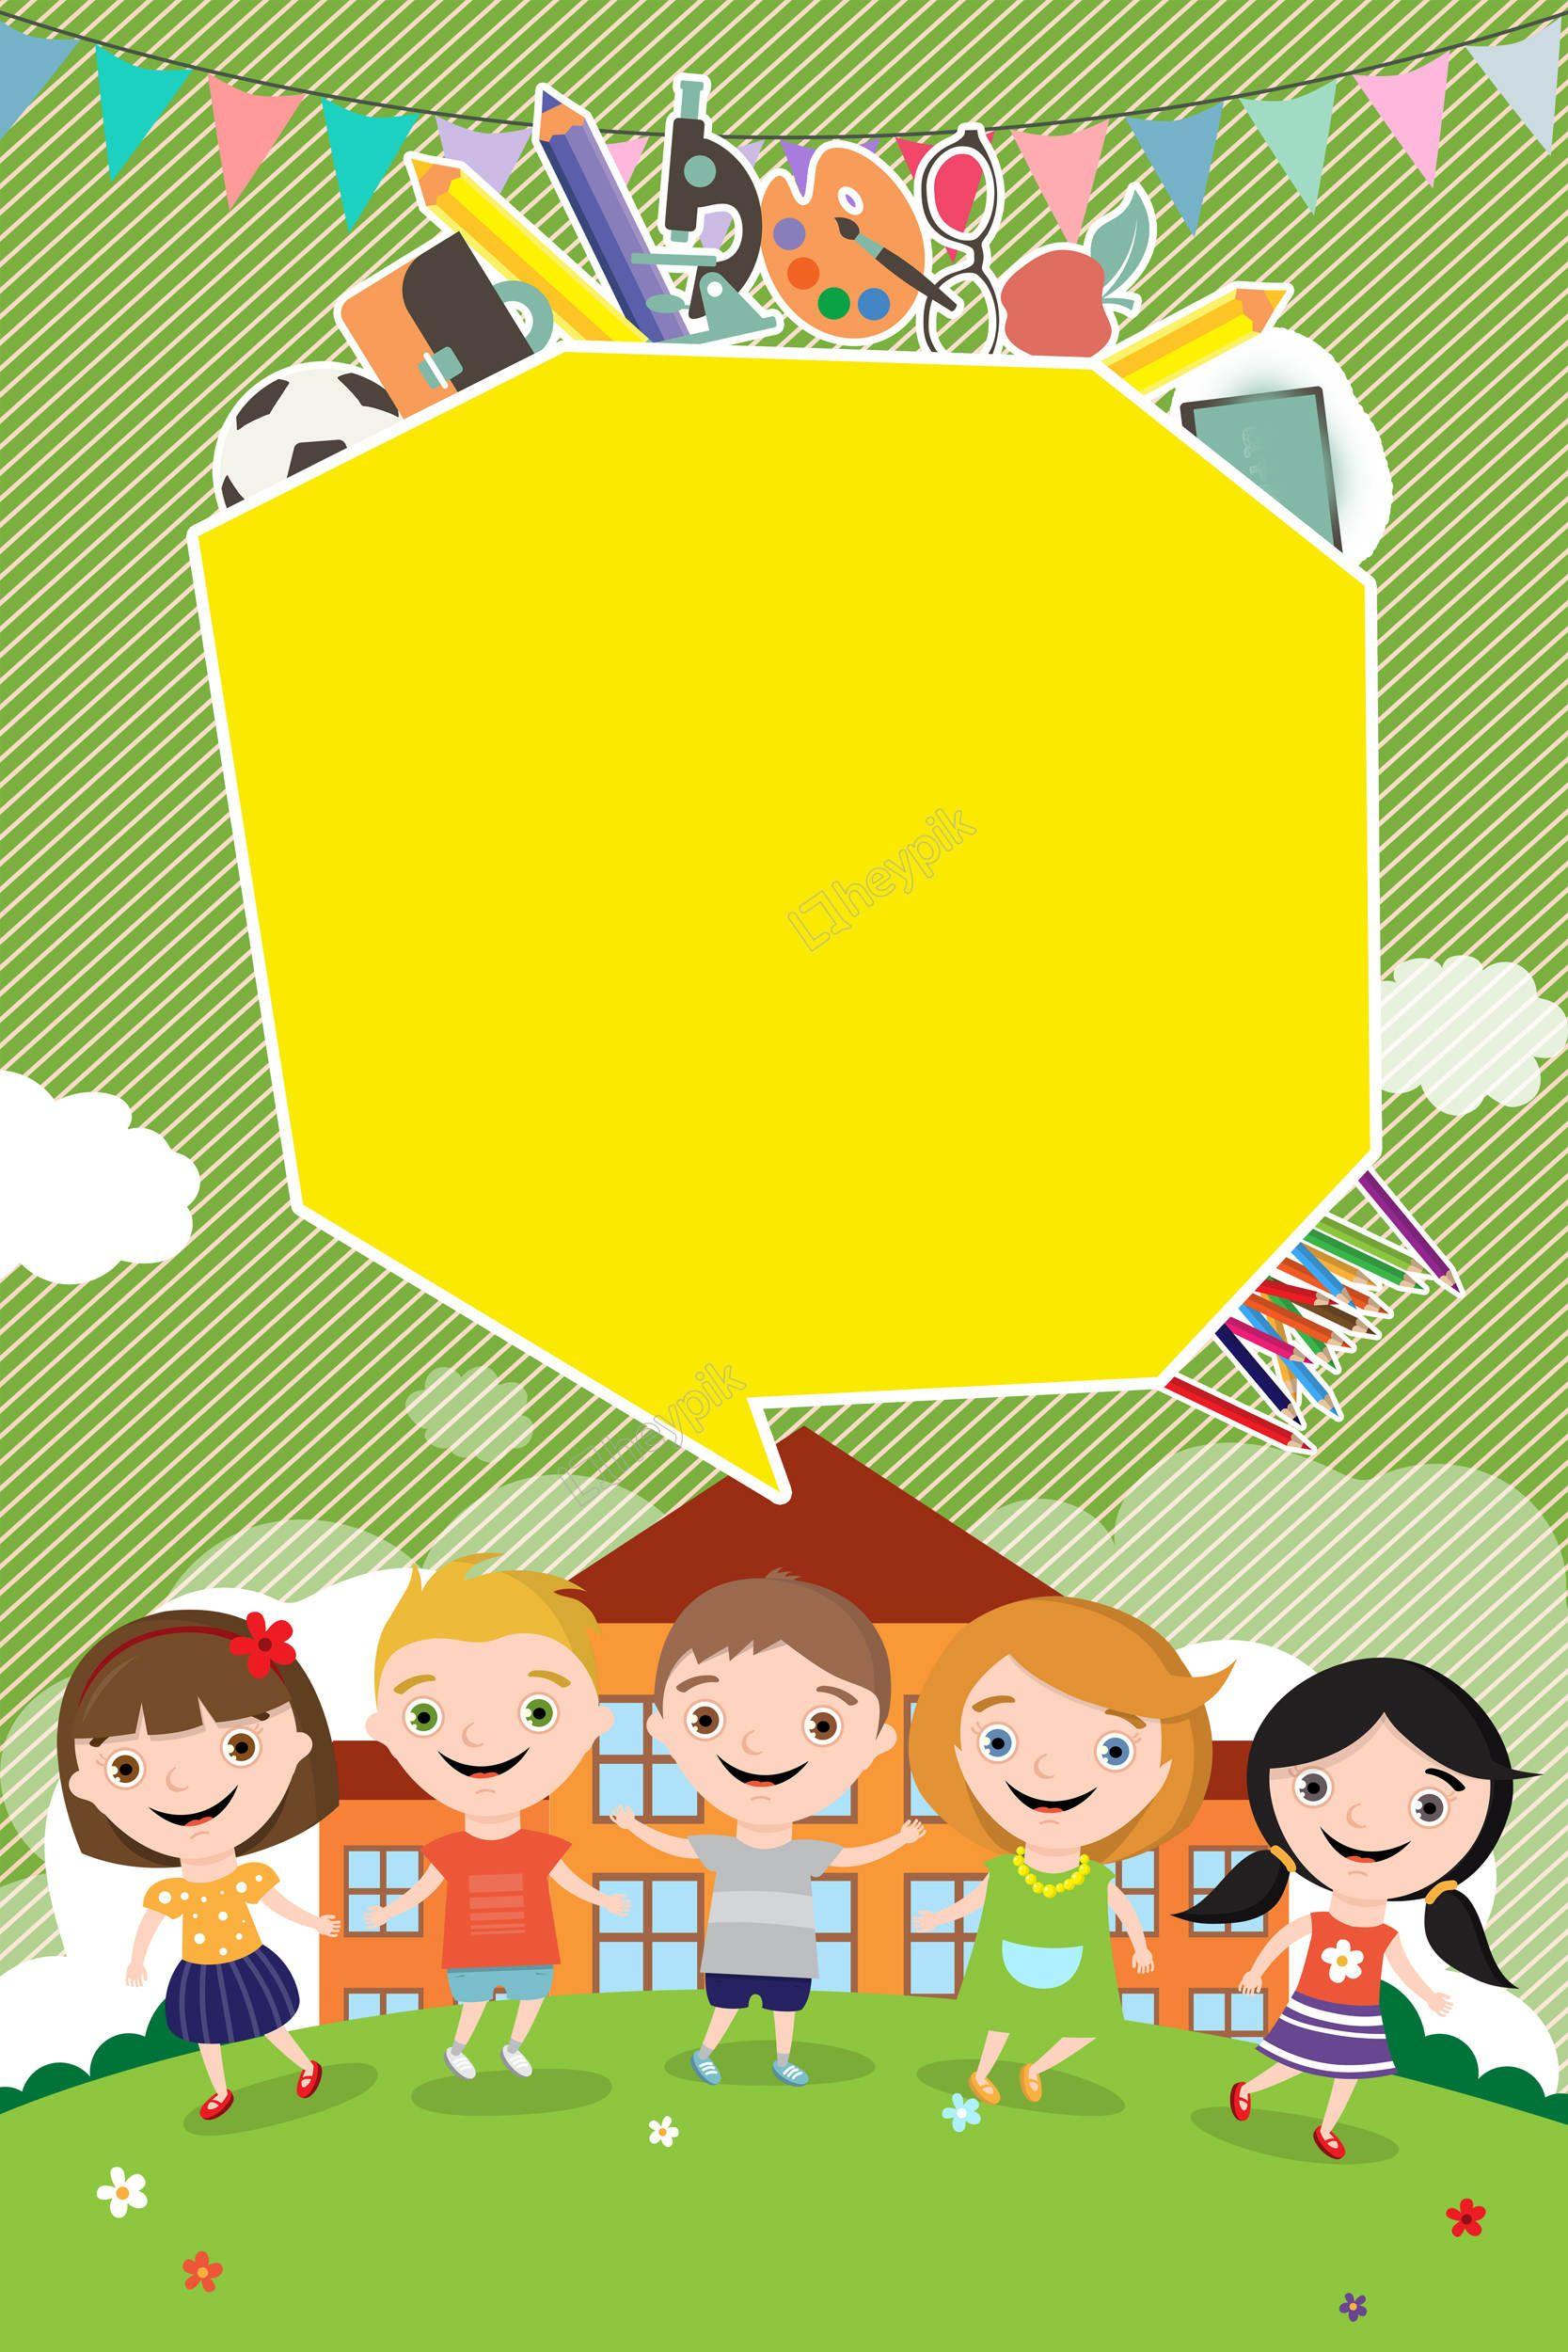 Baground Anak Anak : baground, Kindergarten, Enrollment, Nursery, School, Admissions, Flyer, Green, Cartoon, Hand-painted, Background, Vector, Kartun,, Ilustrasi, Karakter,